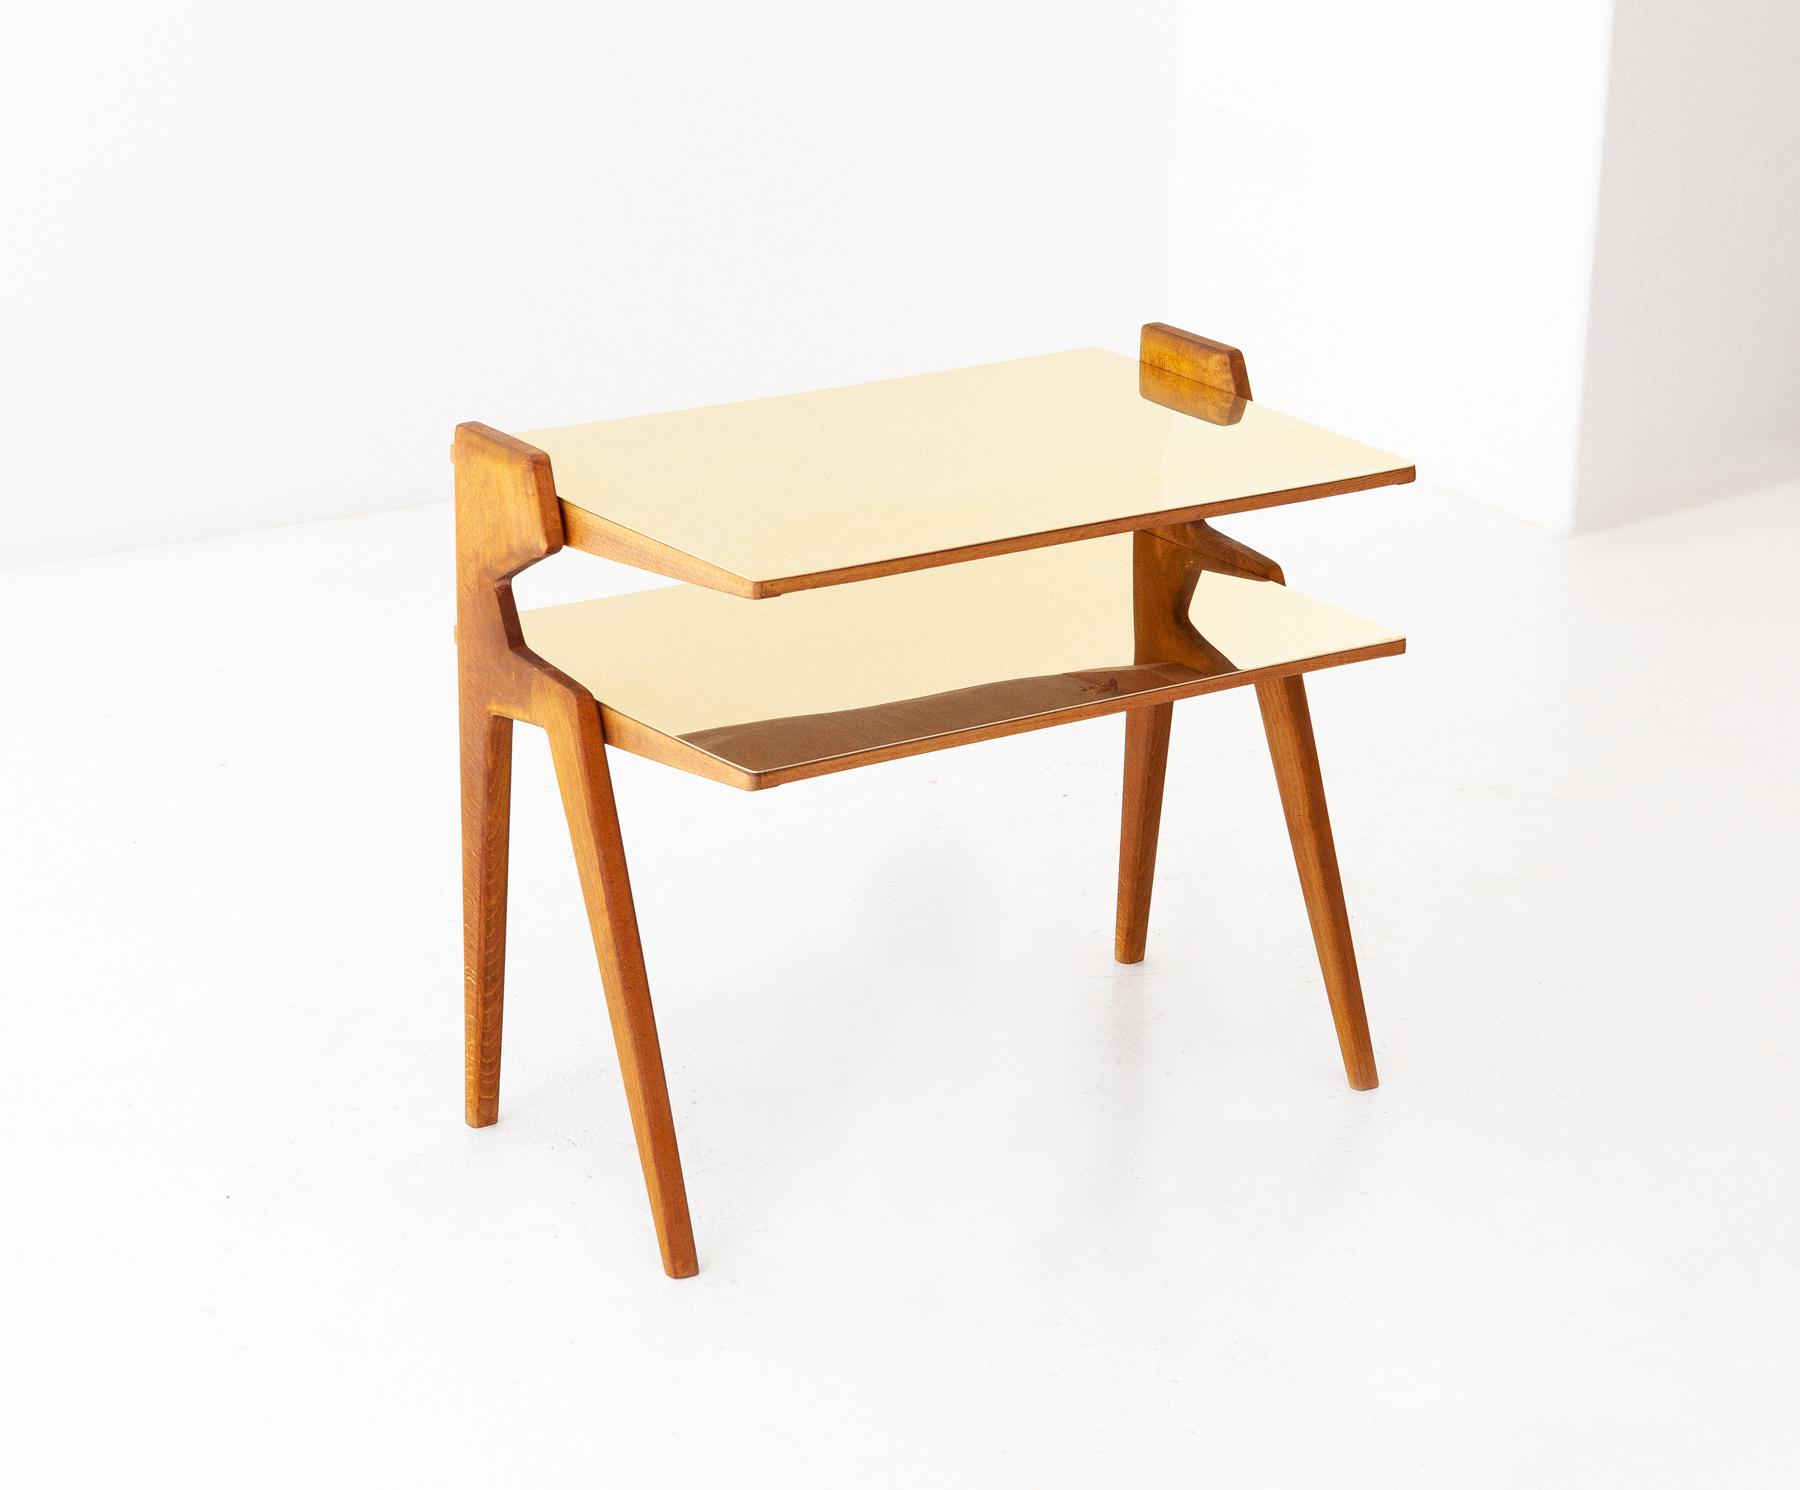 1950s-italian-brass-light-wood-two-levels-side-table-6-t81